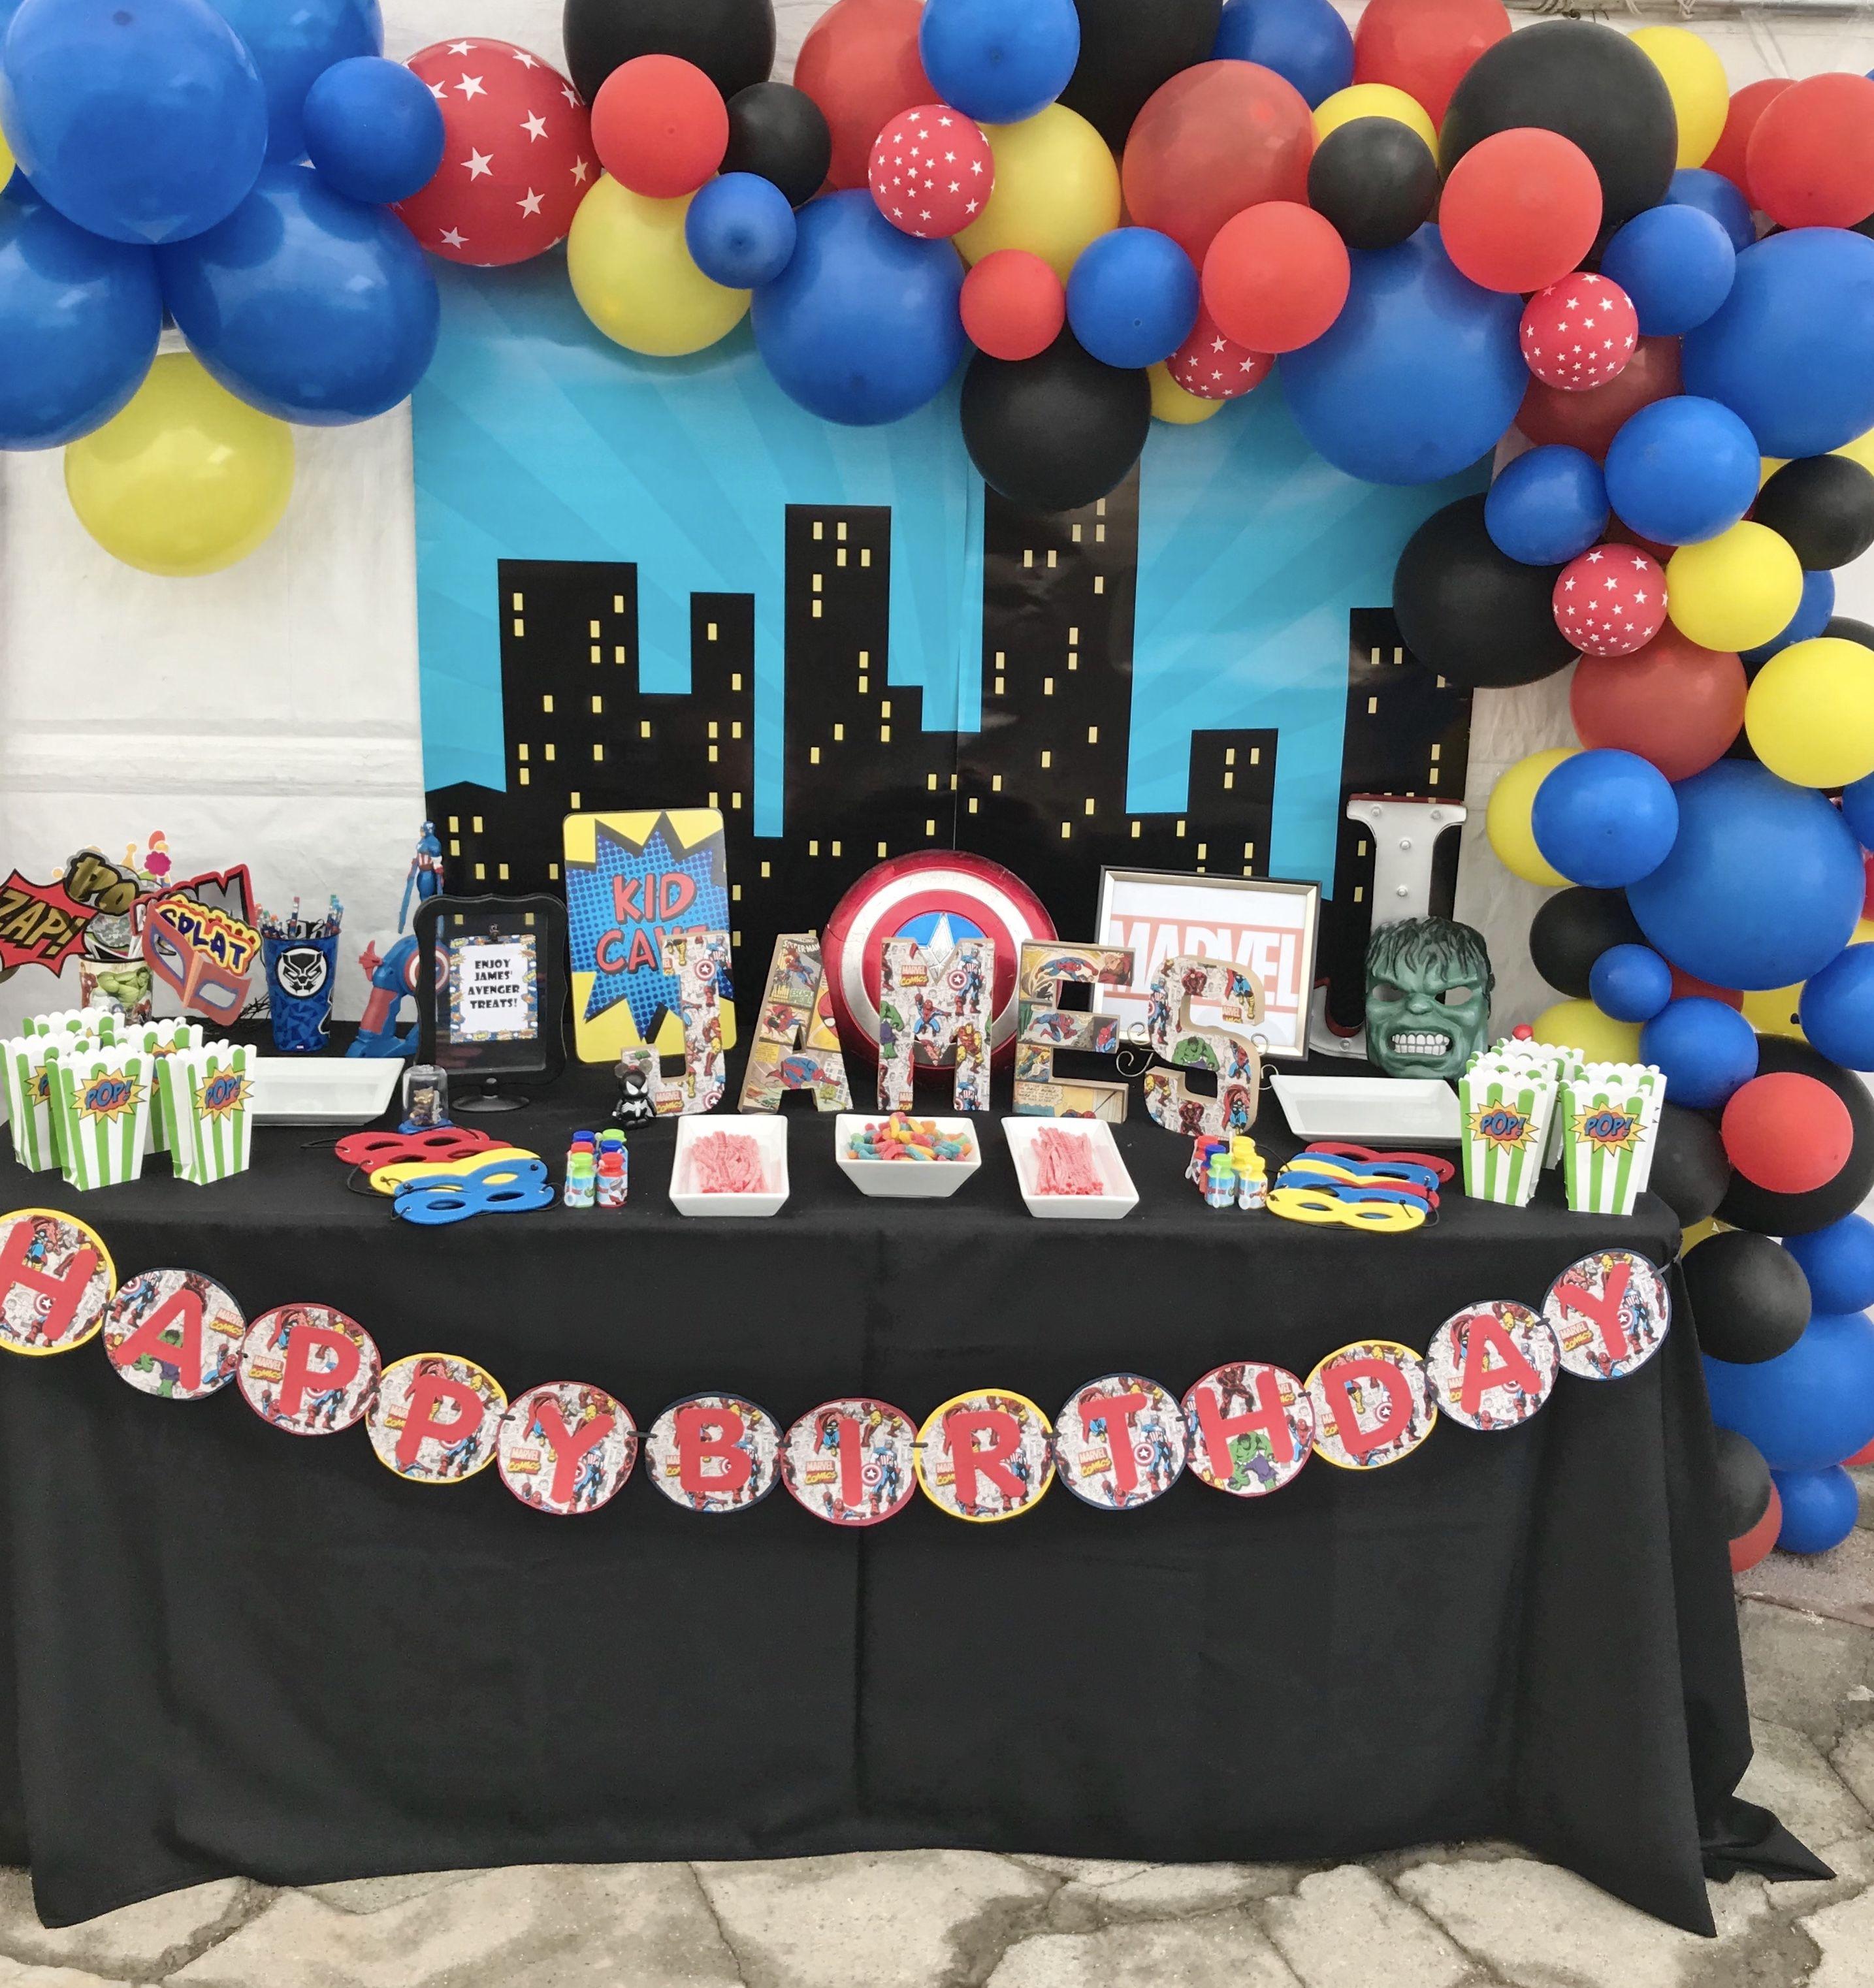 Avengers Dessert Table Birthday Party Decorations Diy Diy Party Decorations Party Decorations